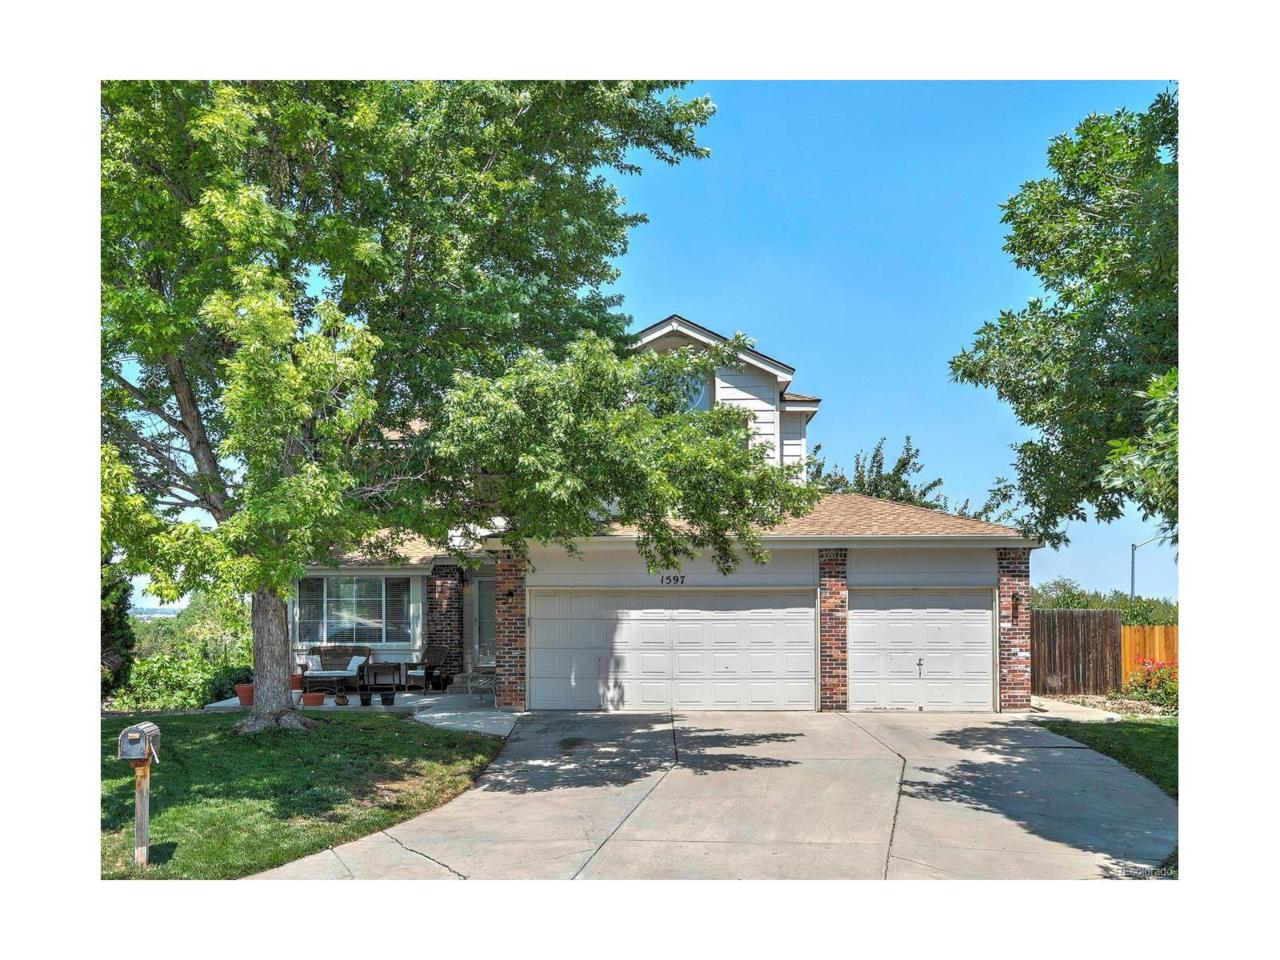 1597 E 133rd Avenue, Thornton, CO 80241 (MLS #2442589) :: 8z Real Estate